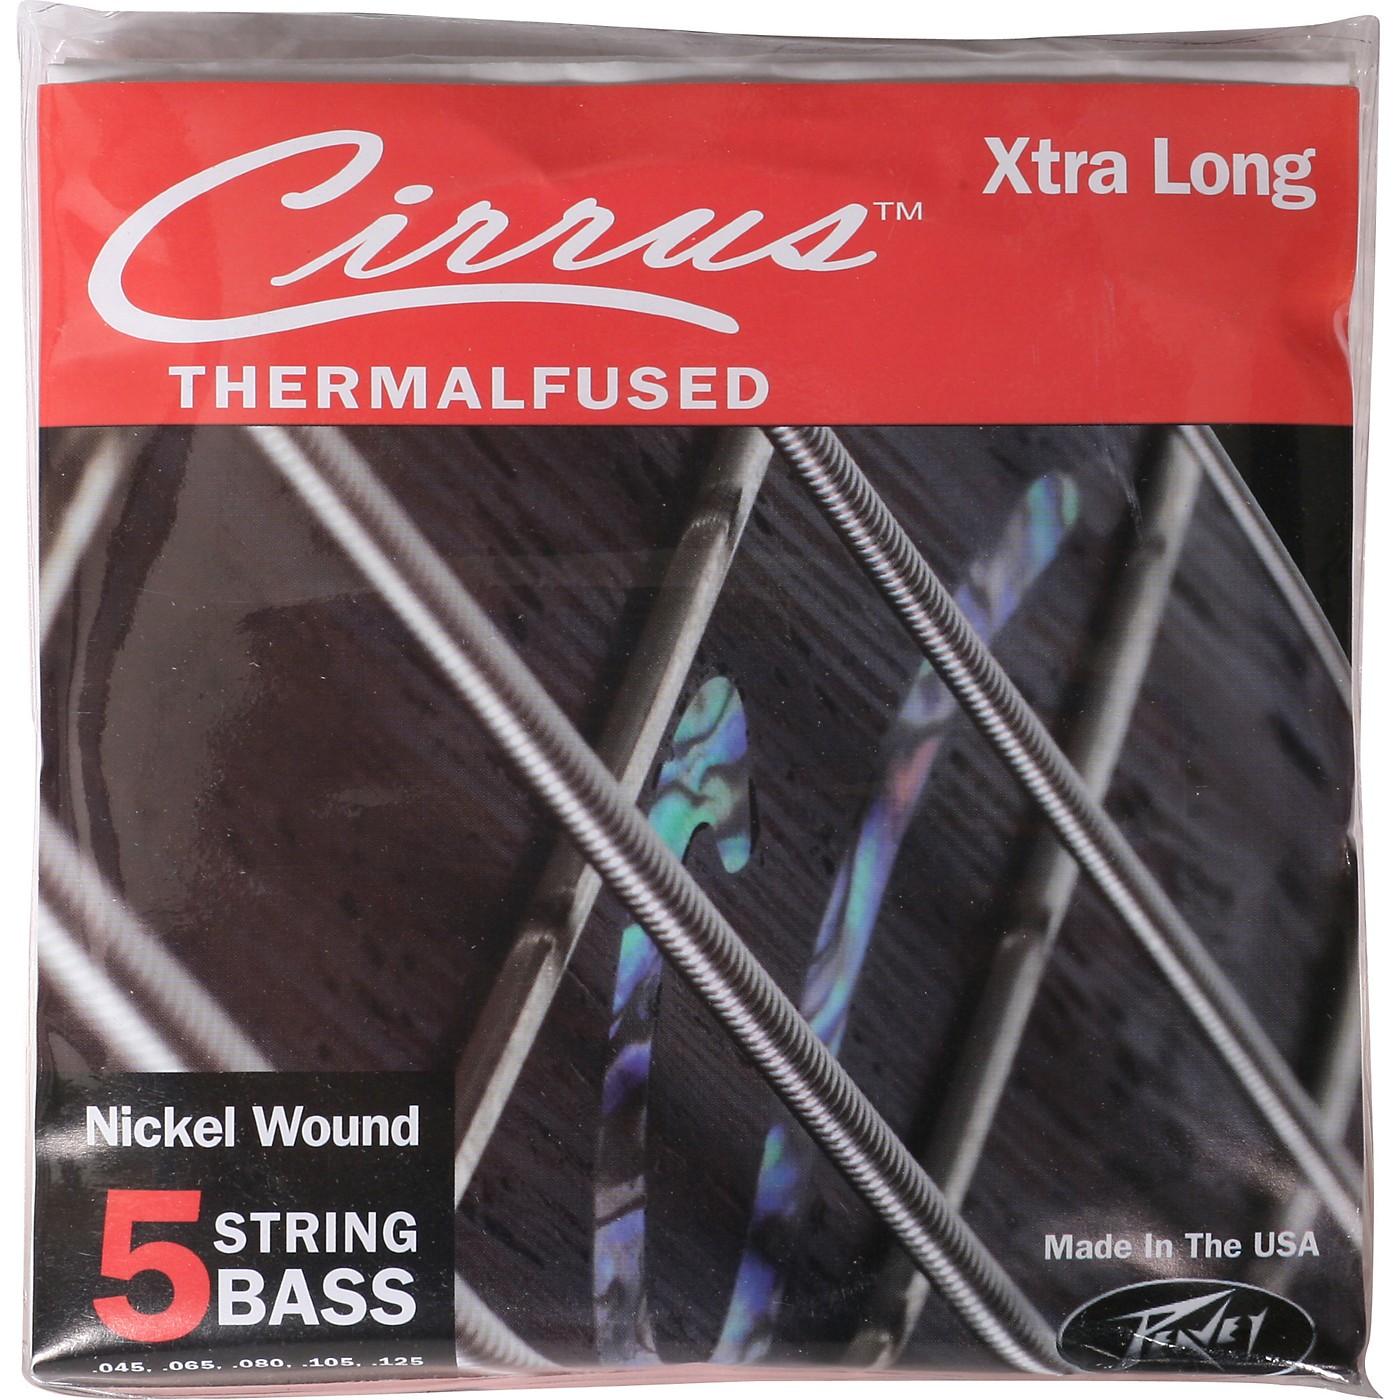 Peavey Cirrus Stainless Steel Strings 5XL thumbnail